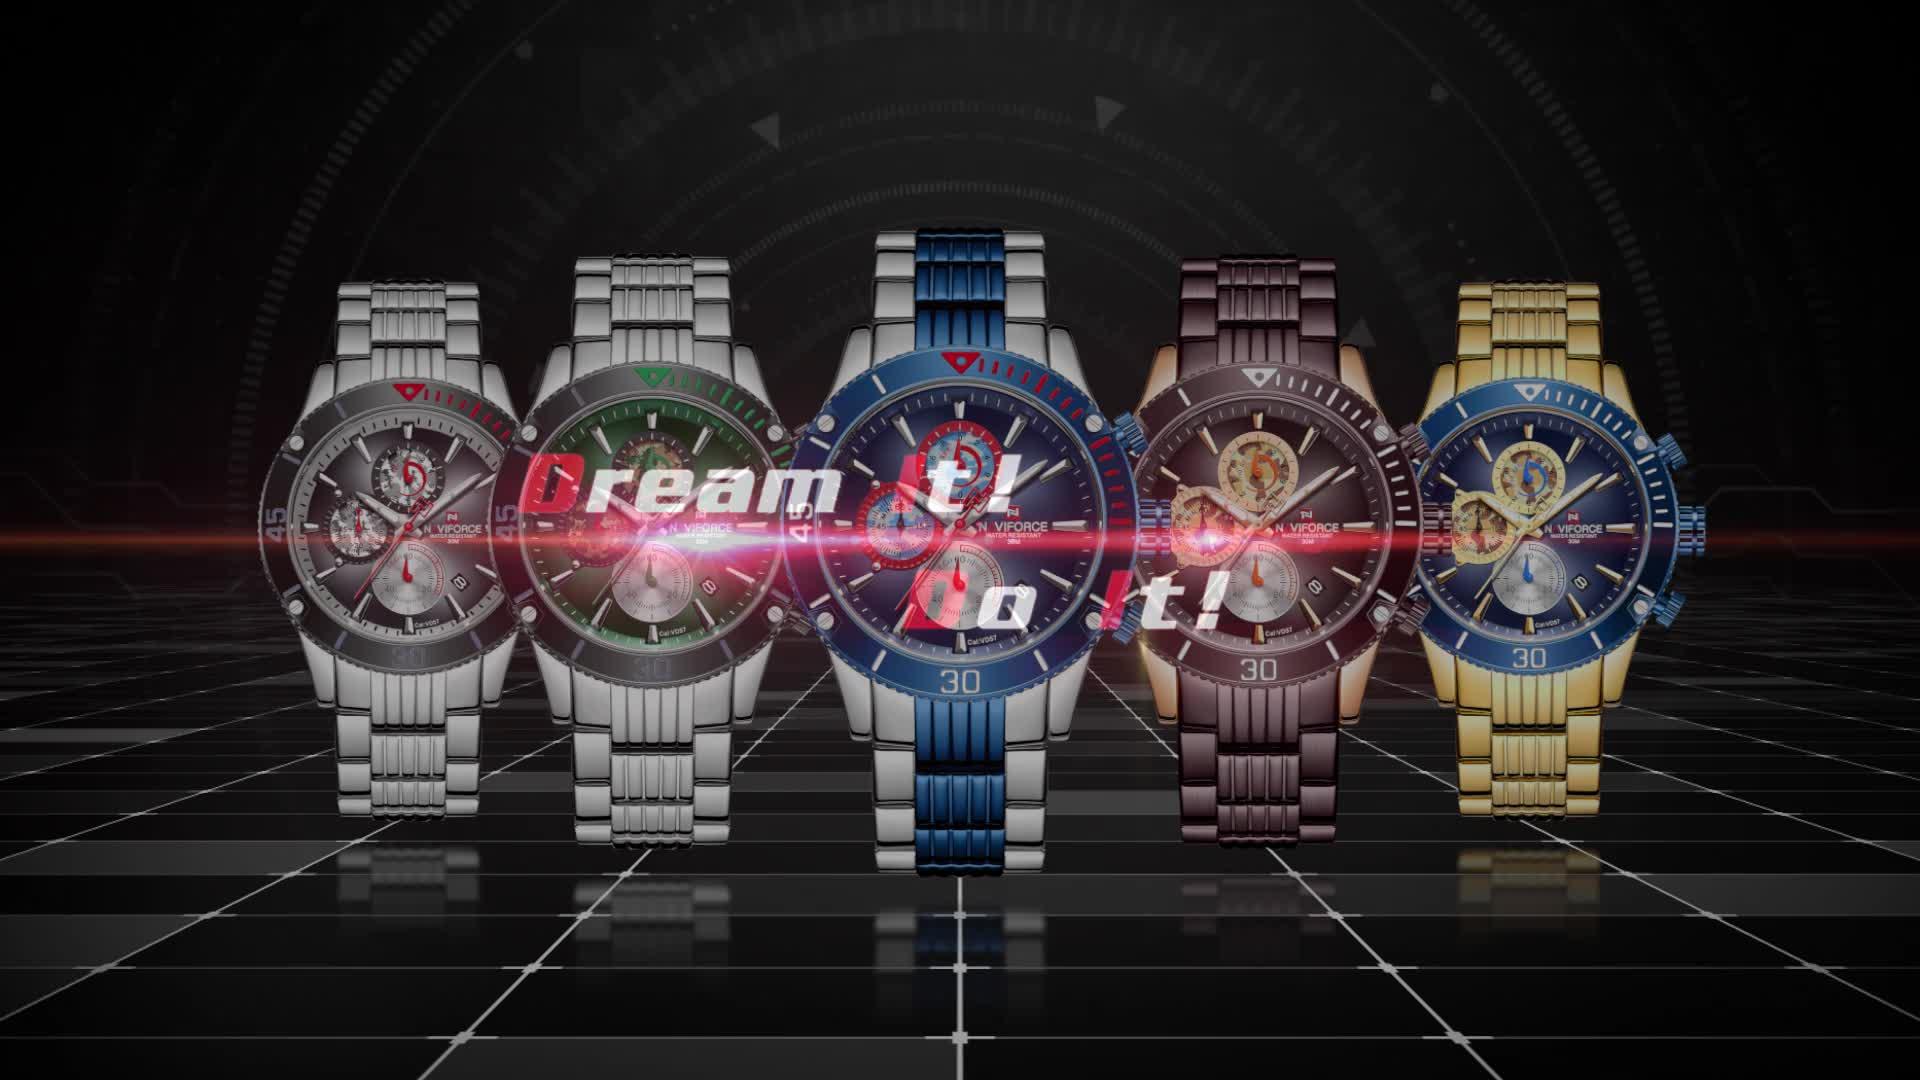 2020 neue Chronograph Wasserdicht Quarz Männer Uhr Armbanduhren NAVIFORCE 9173 Sport